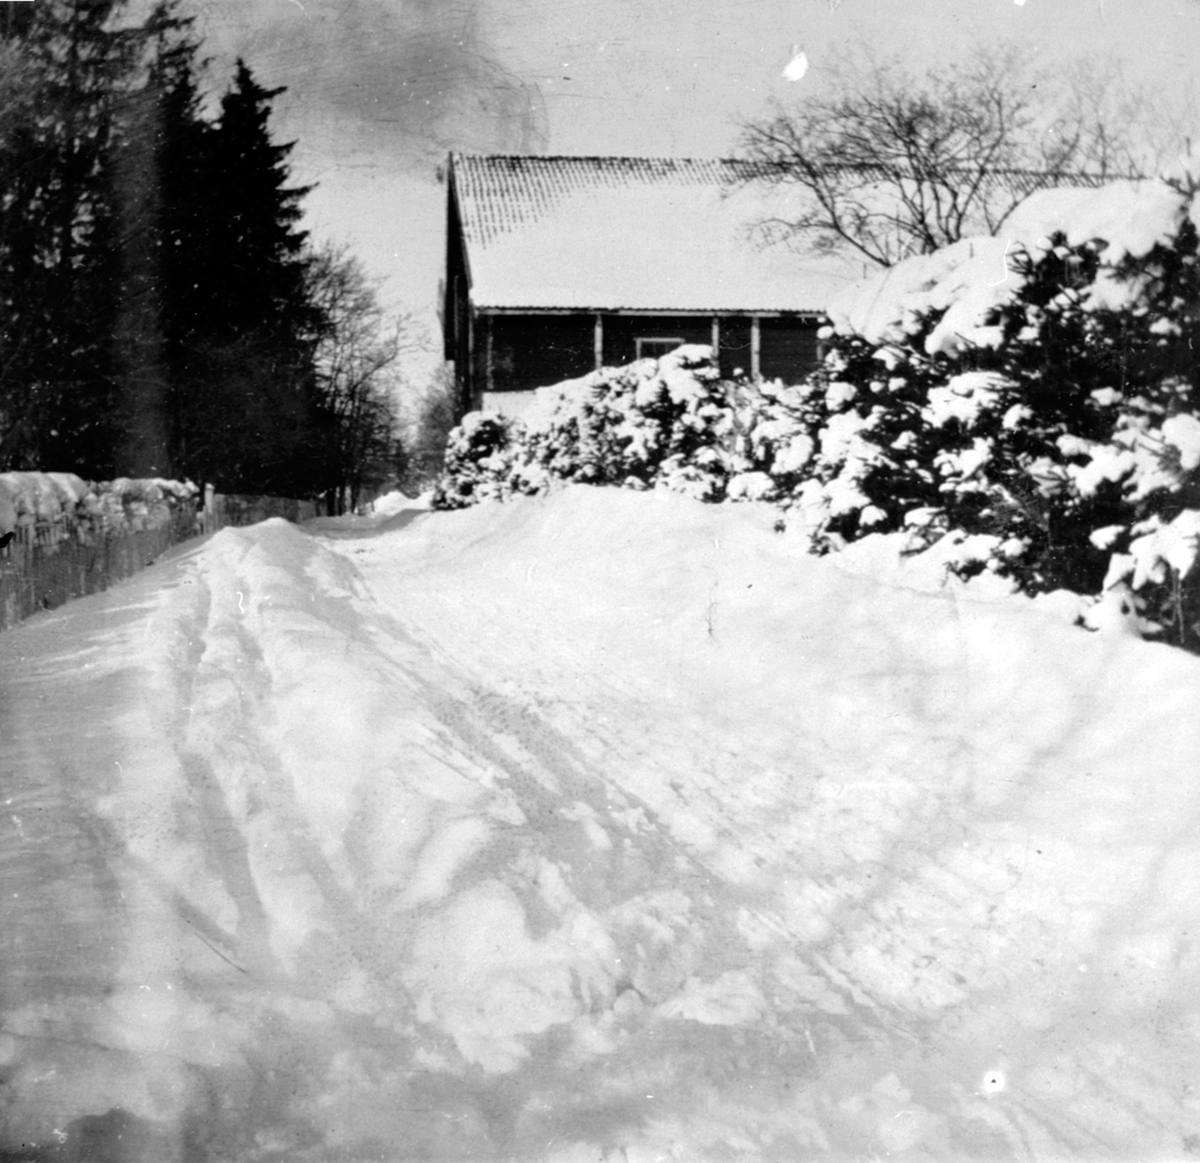 Låven på Hovelsrud, Helgøya. Vinter med mye snø. Skispor.